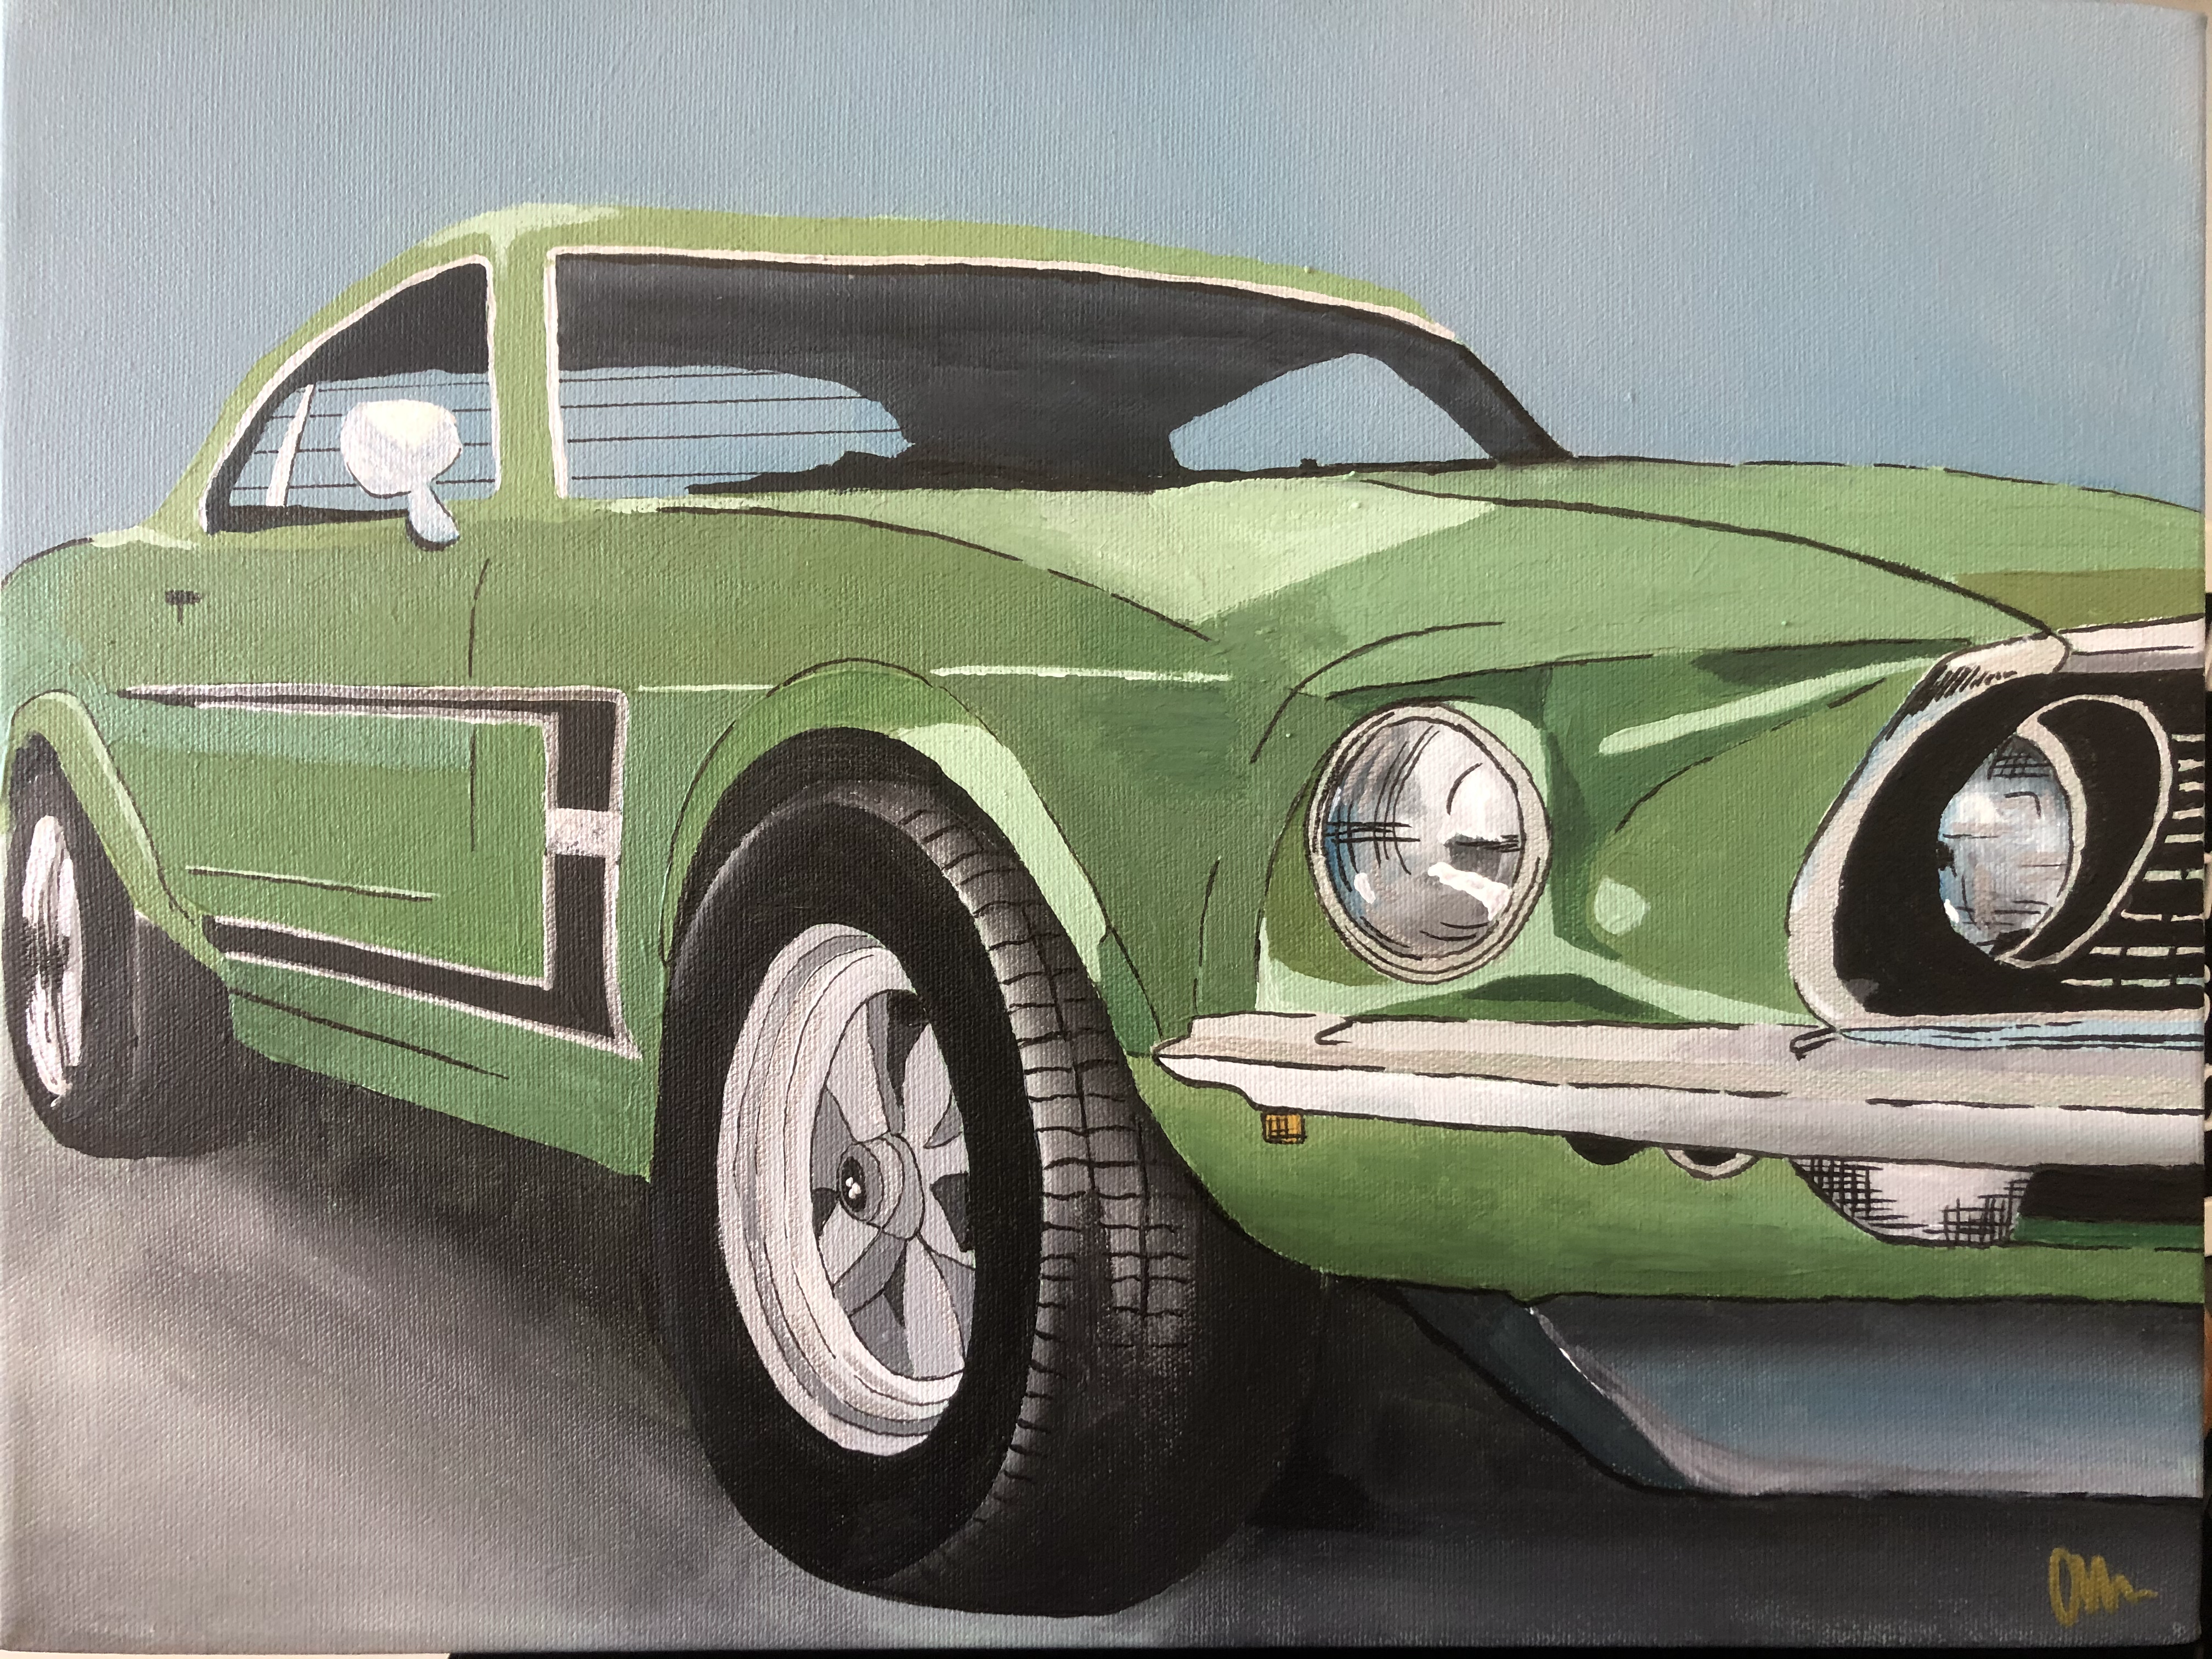 Green Mustang Painting